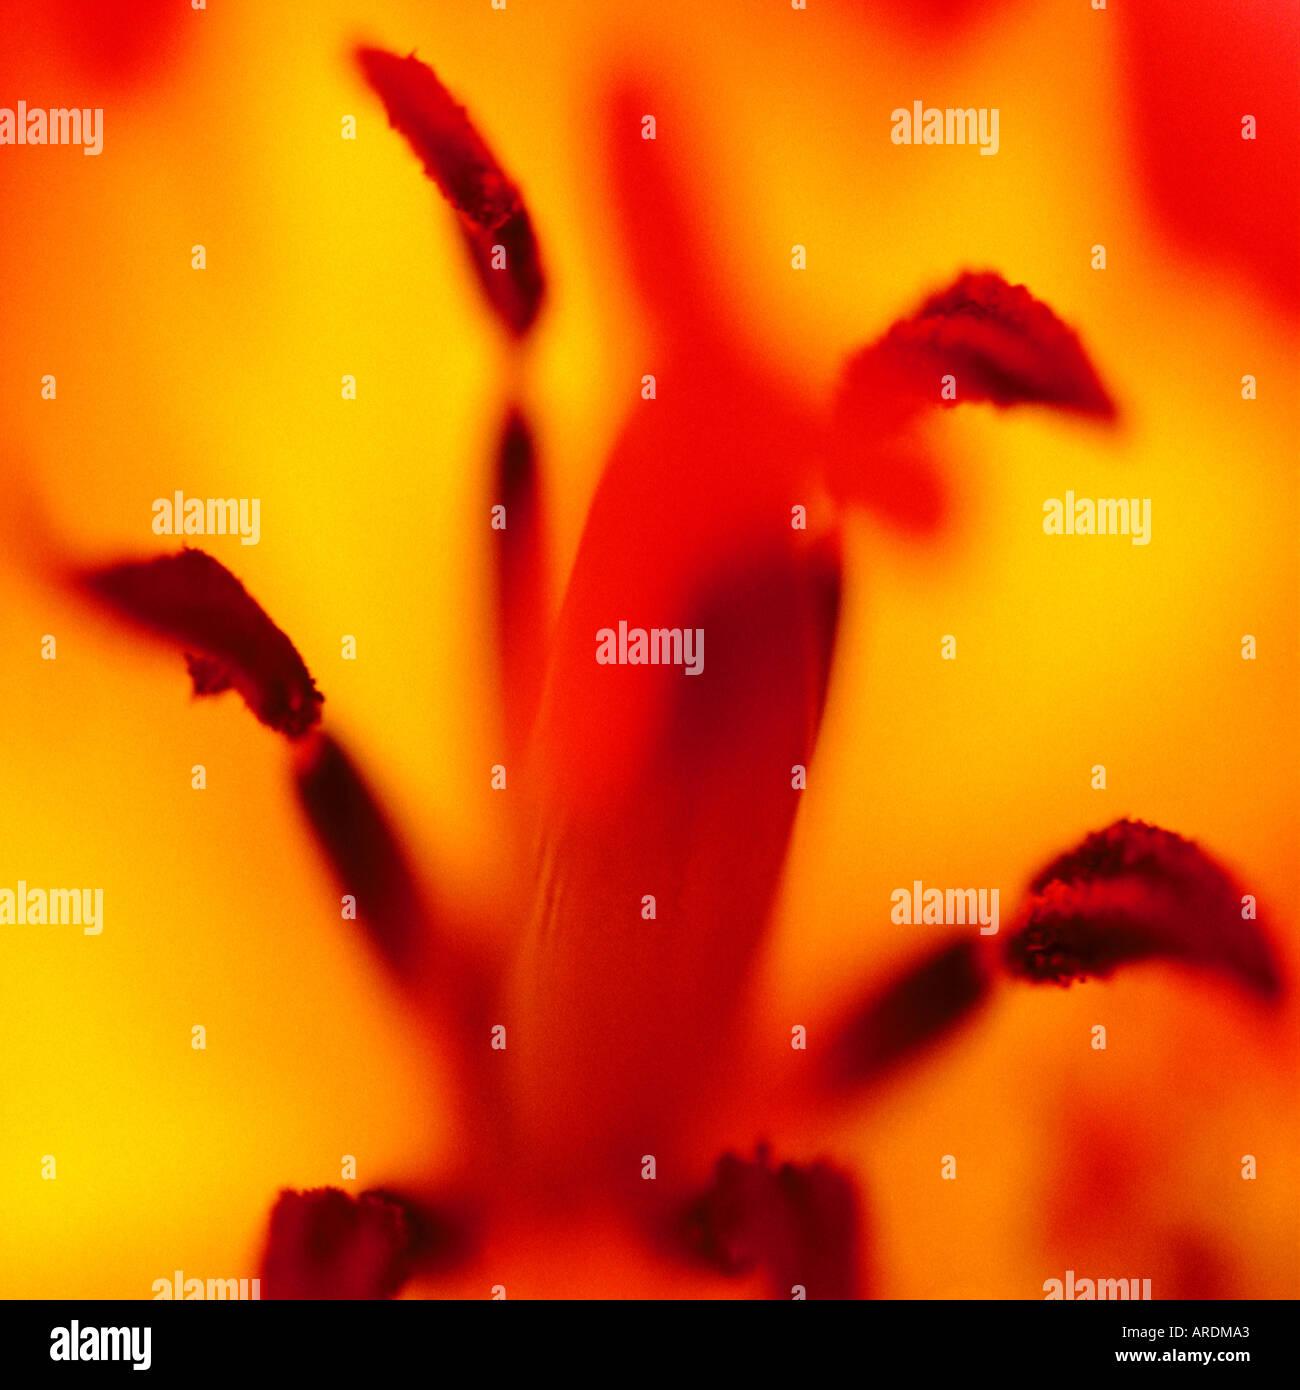 Tulip closeup - Stock Image